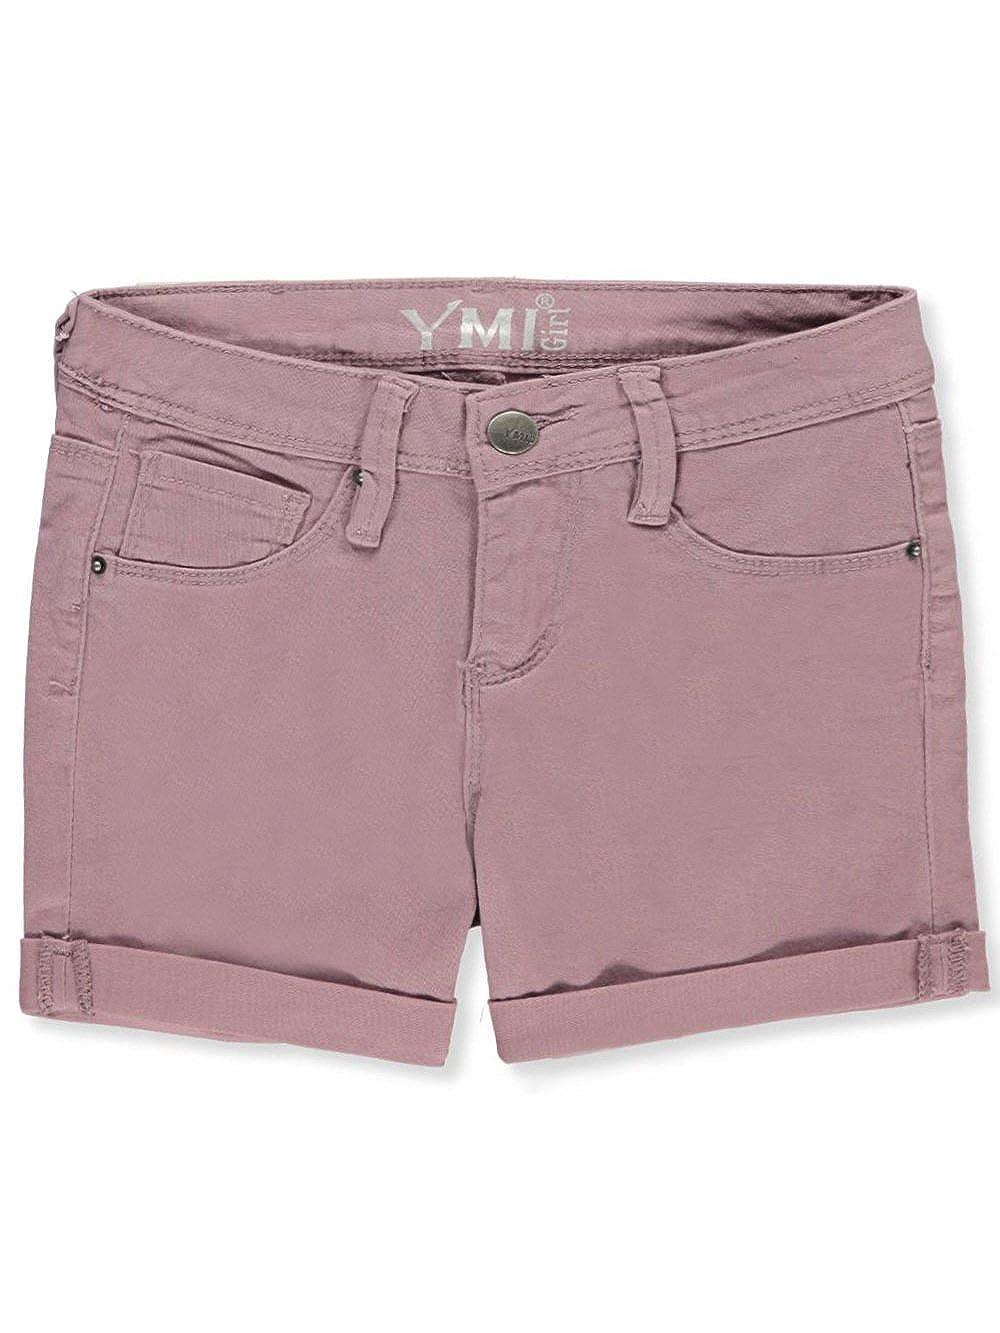 YMI Girls' Shorts YMI Girls' Shorts P000487163